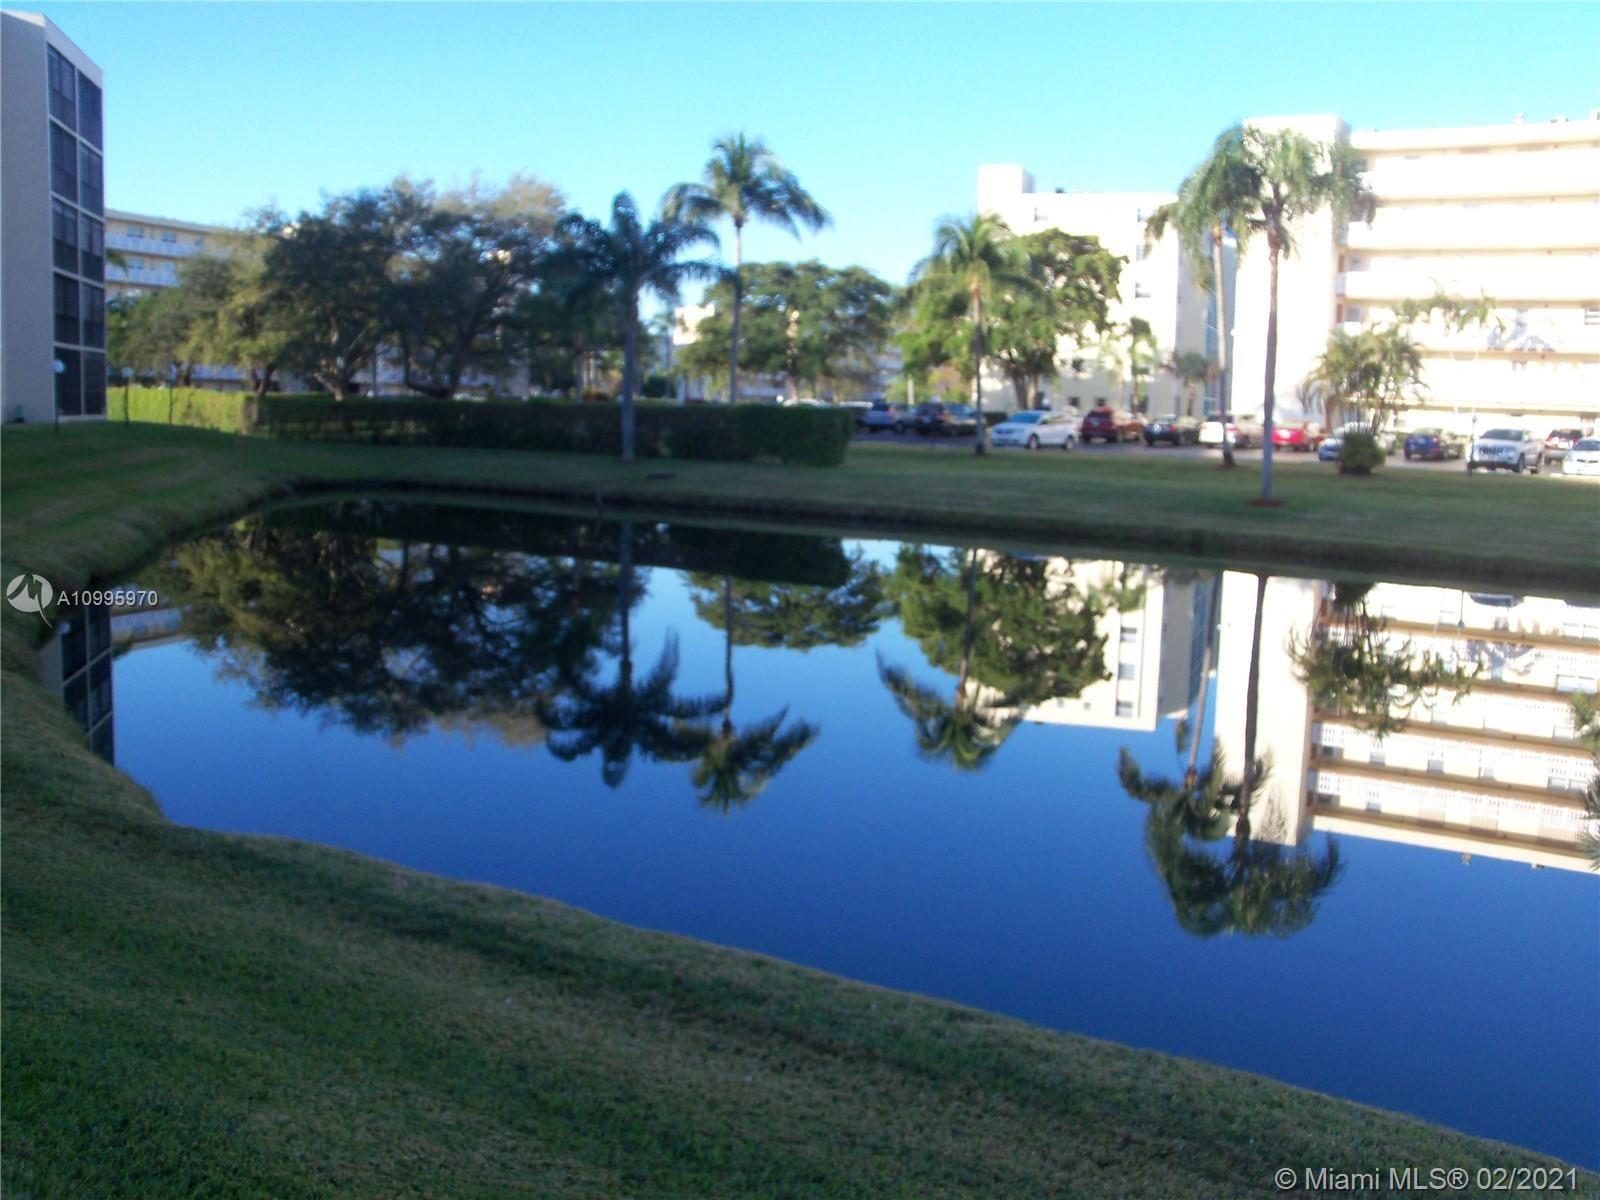 Photo of 170 SE 5th Ave #107, Dania Beach, FL 33004 (MLS # A10995970)